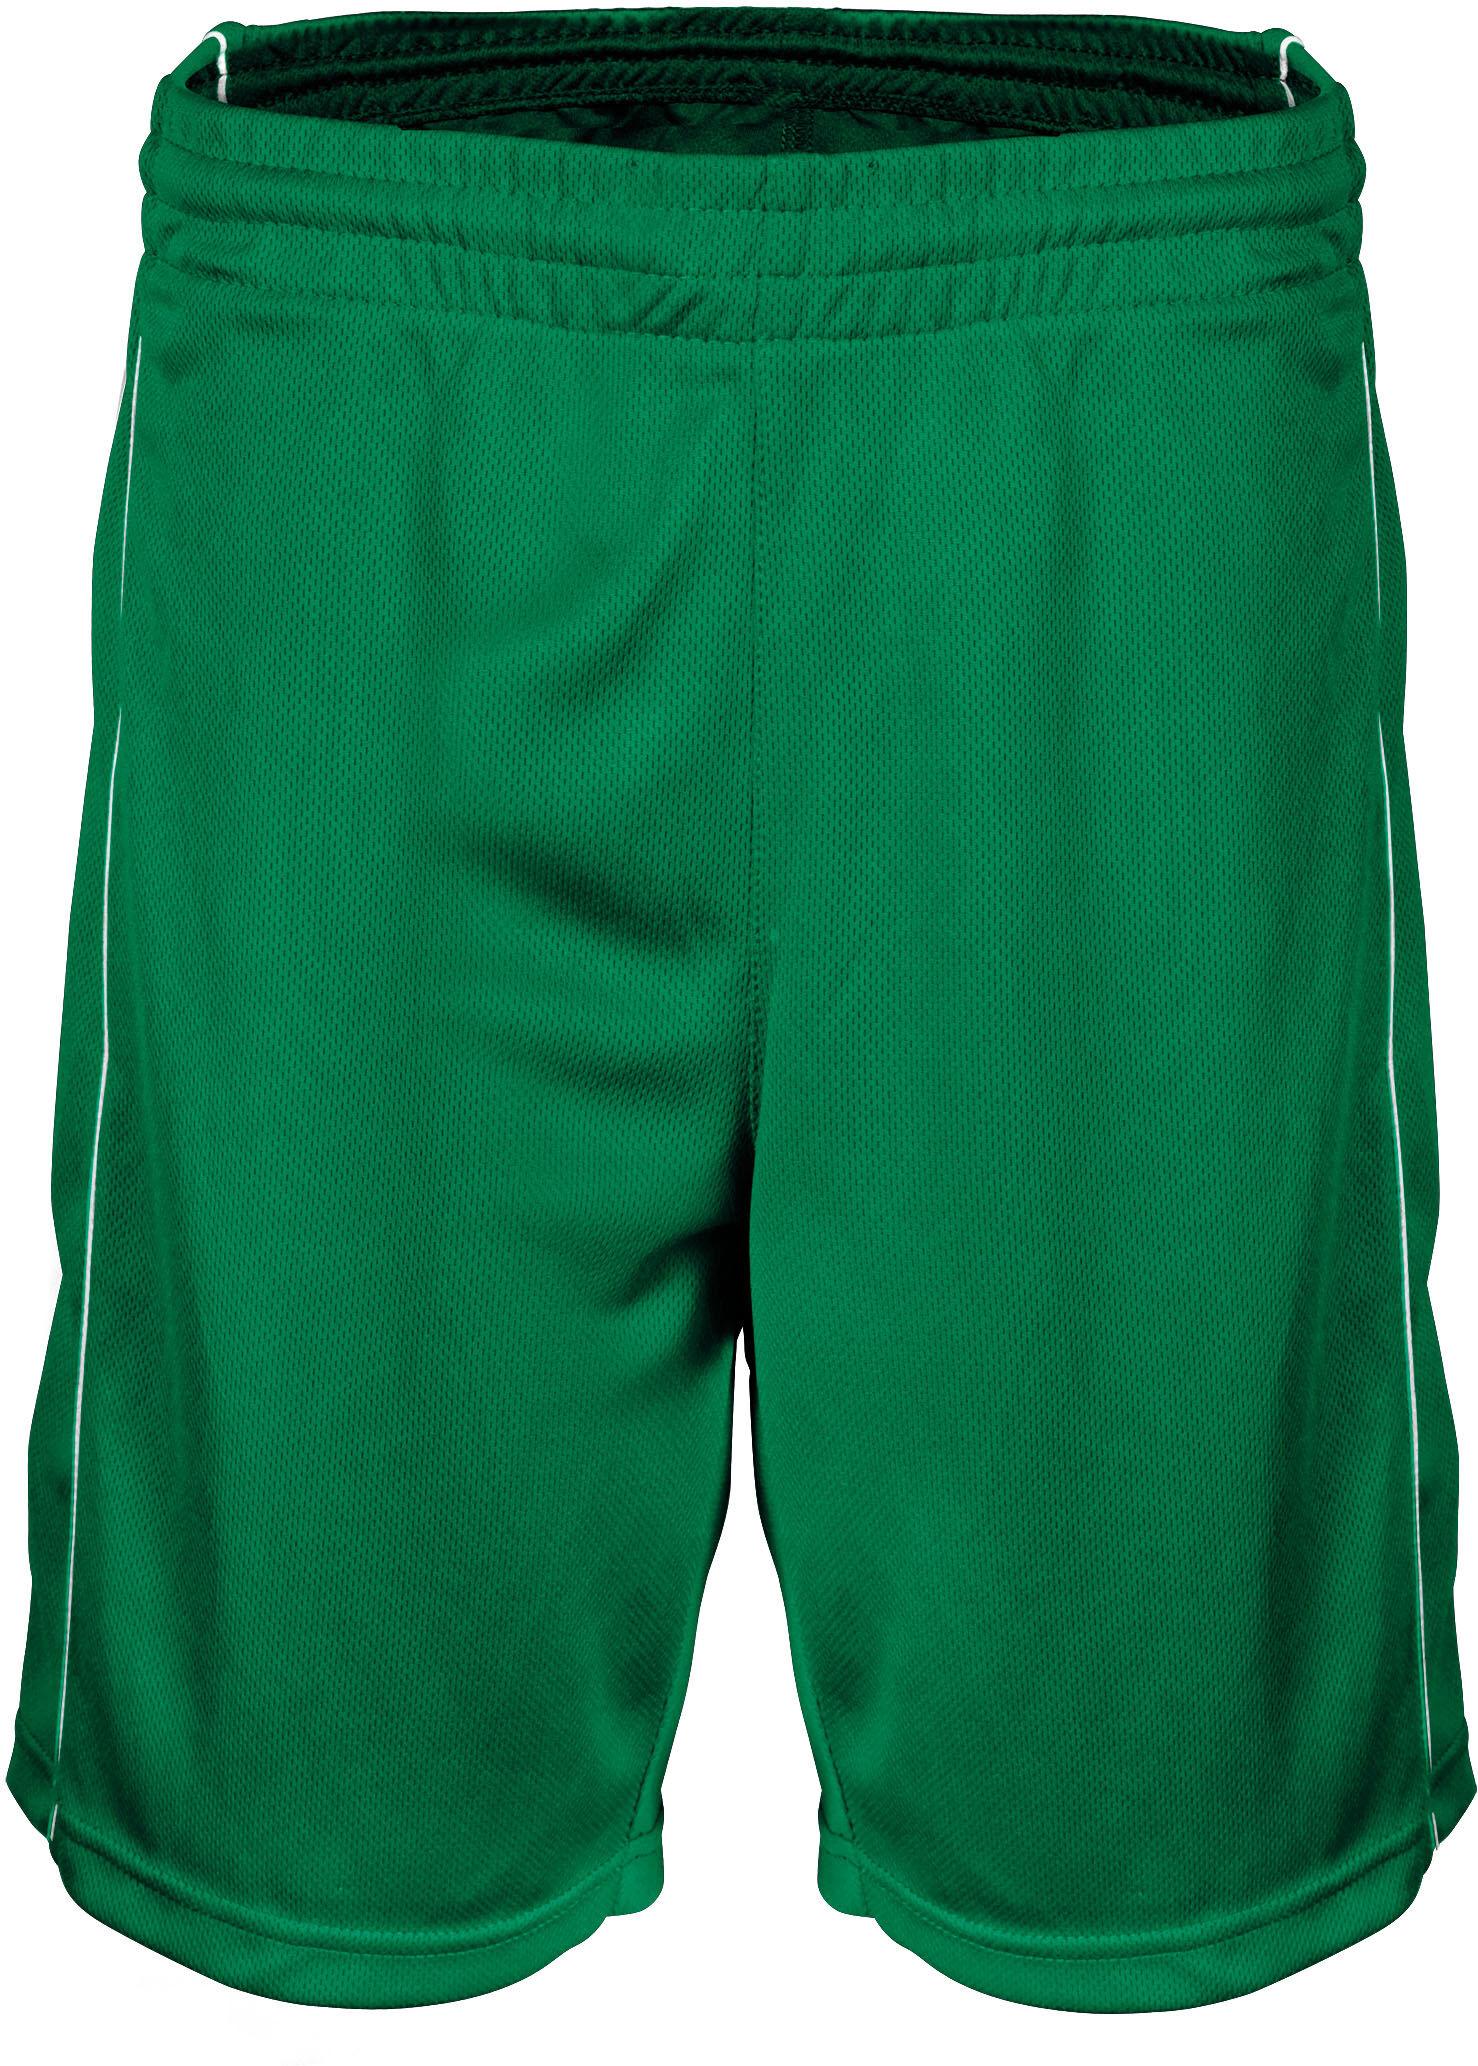 short femme basket ball dark kelly green proact. Black Bedroom Furniture Sets. Home Design Ideas